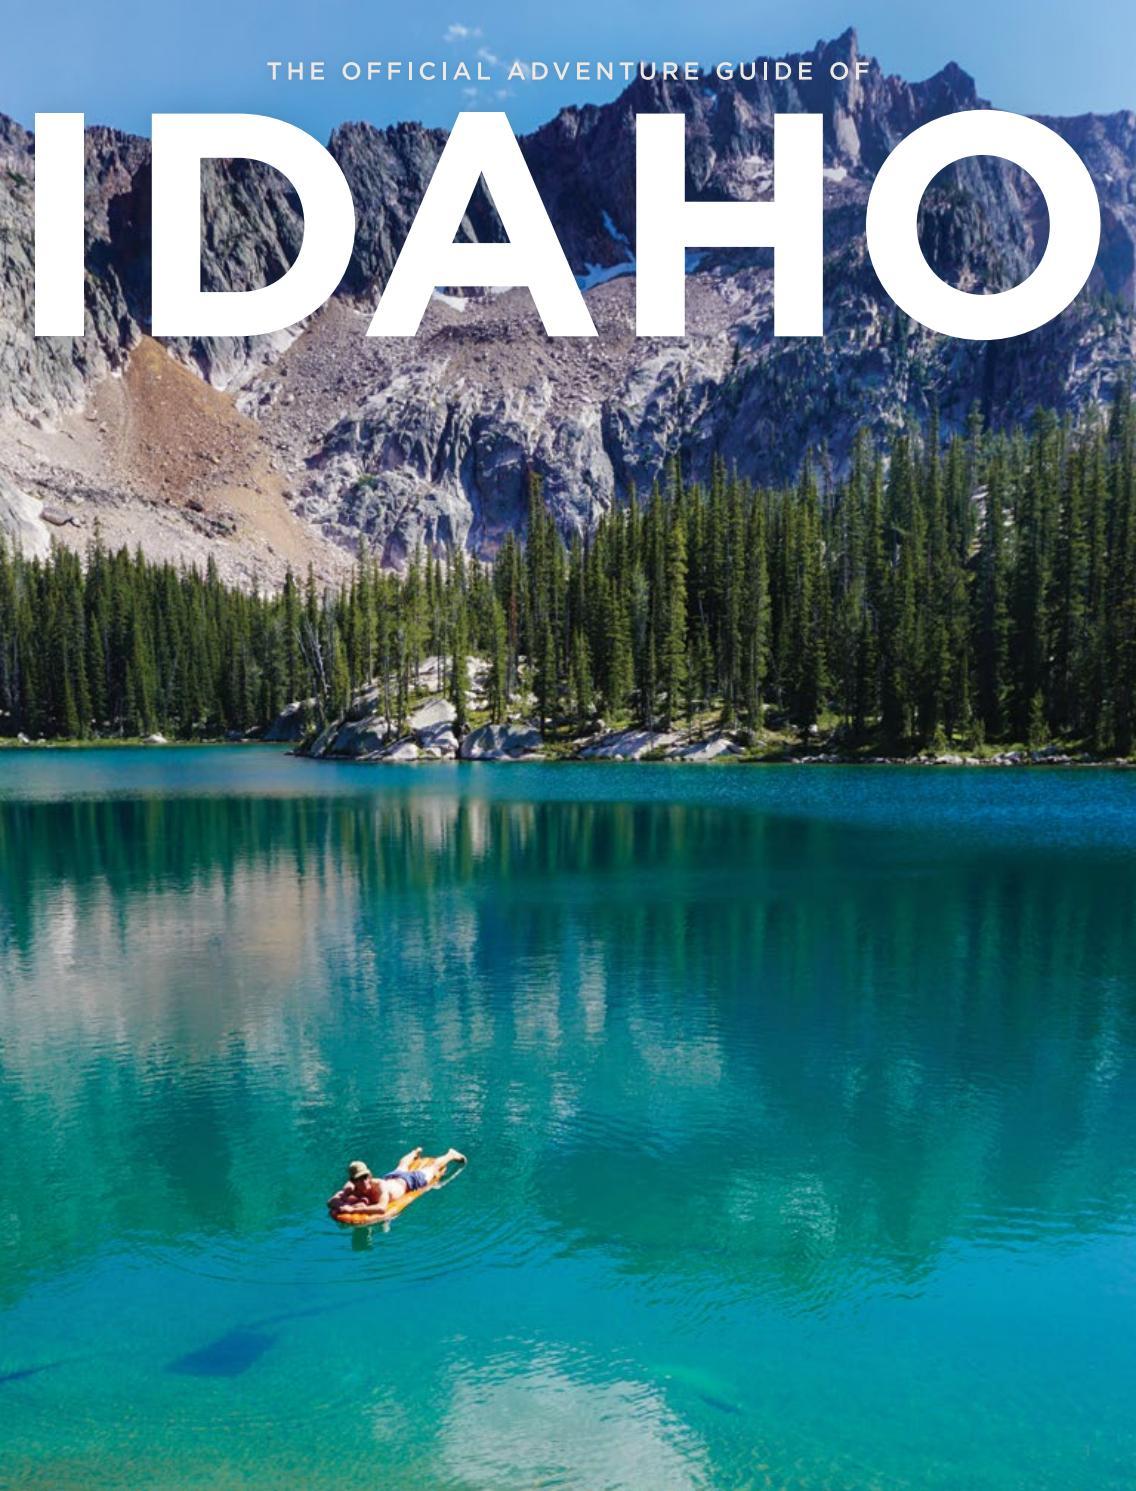 Idaho Fun Facts